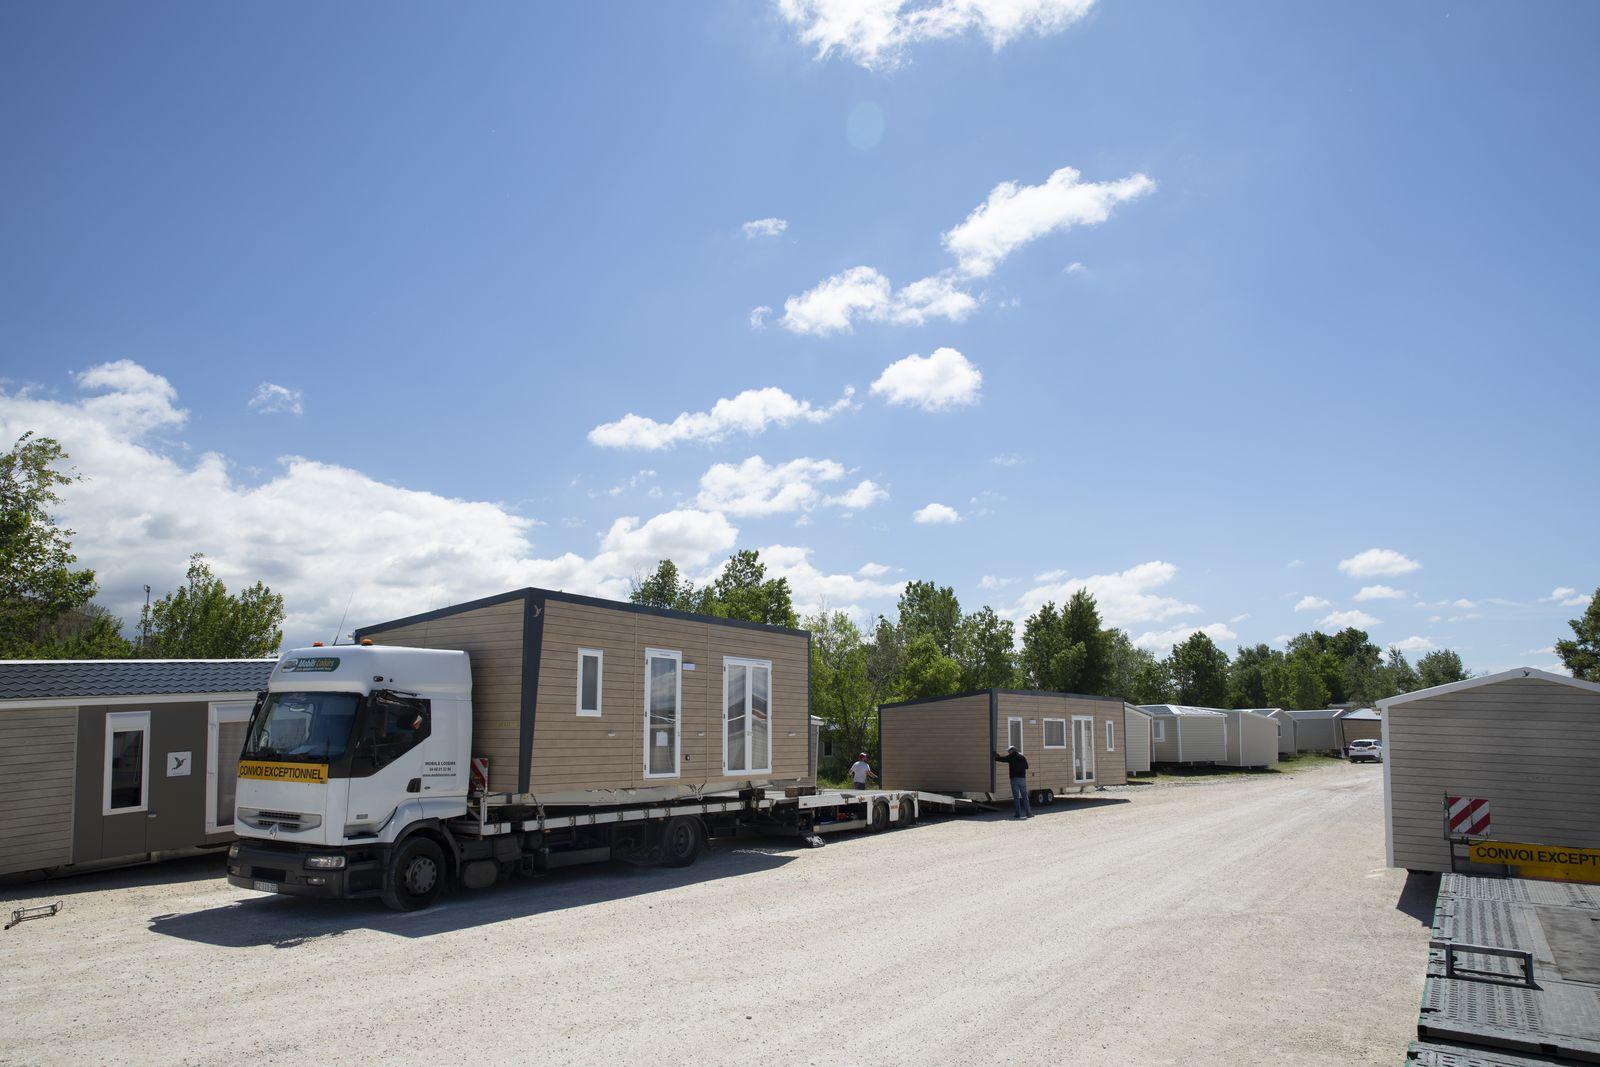 residences trigano-reglementation-mobil-home-transport